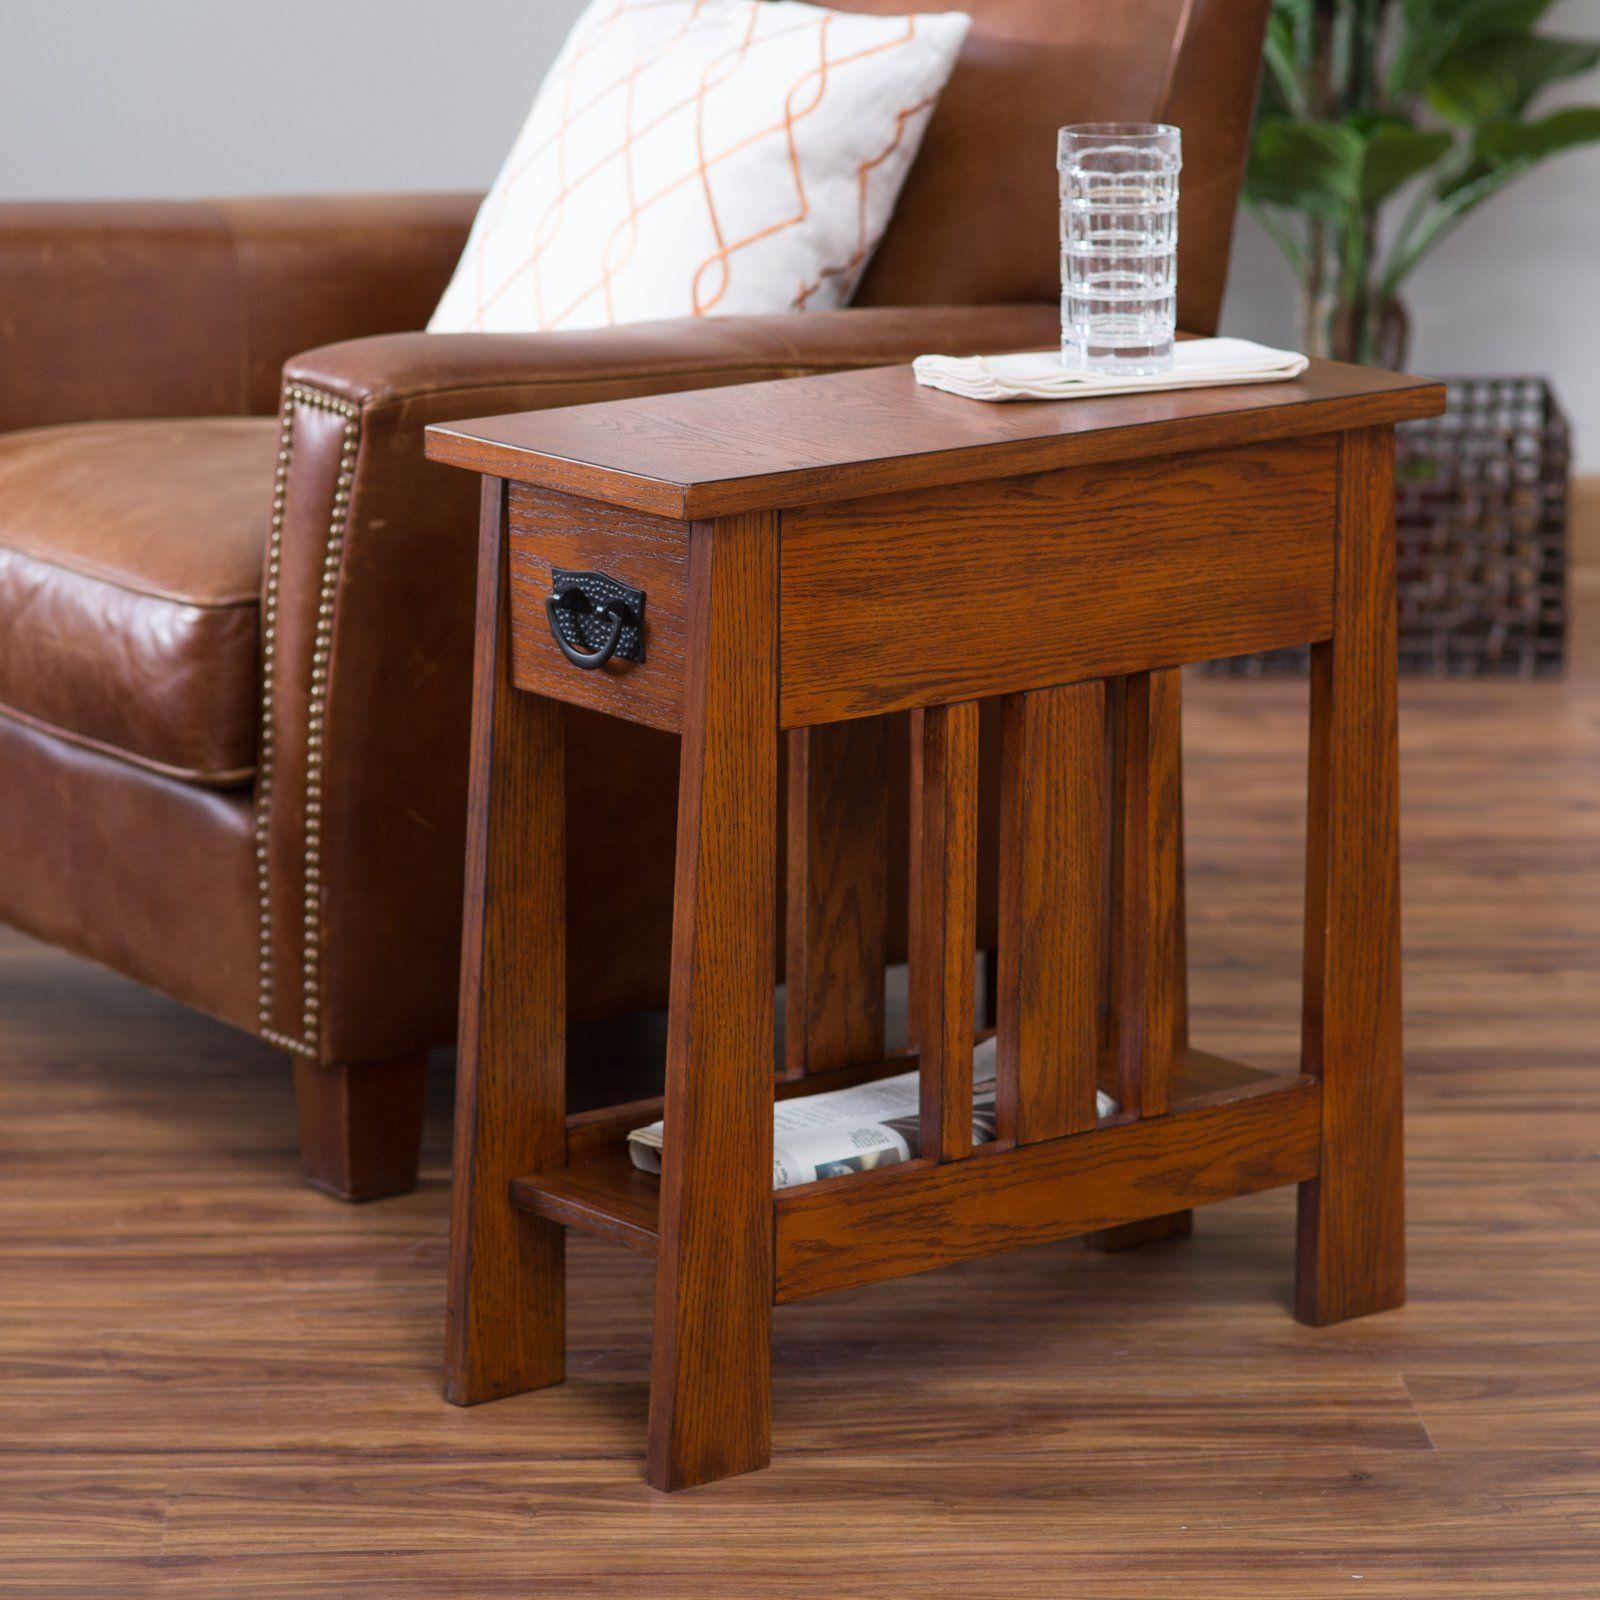 Belham Living Everett Mission Side Table Www Hayneedle Com Style End Tables Room Furniture